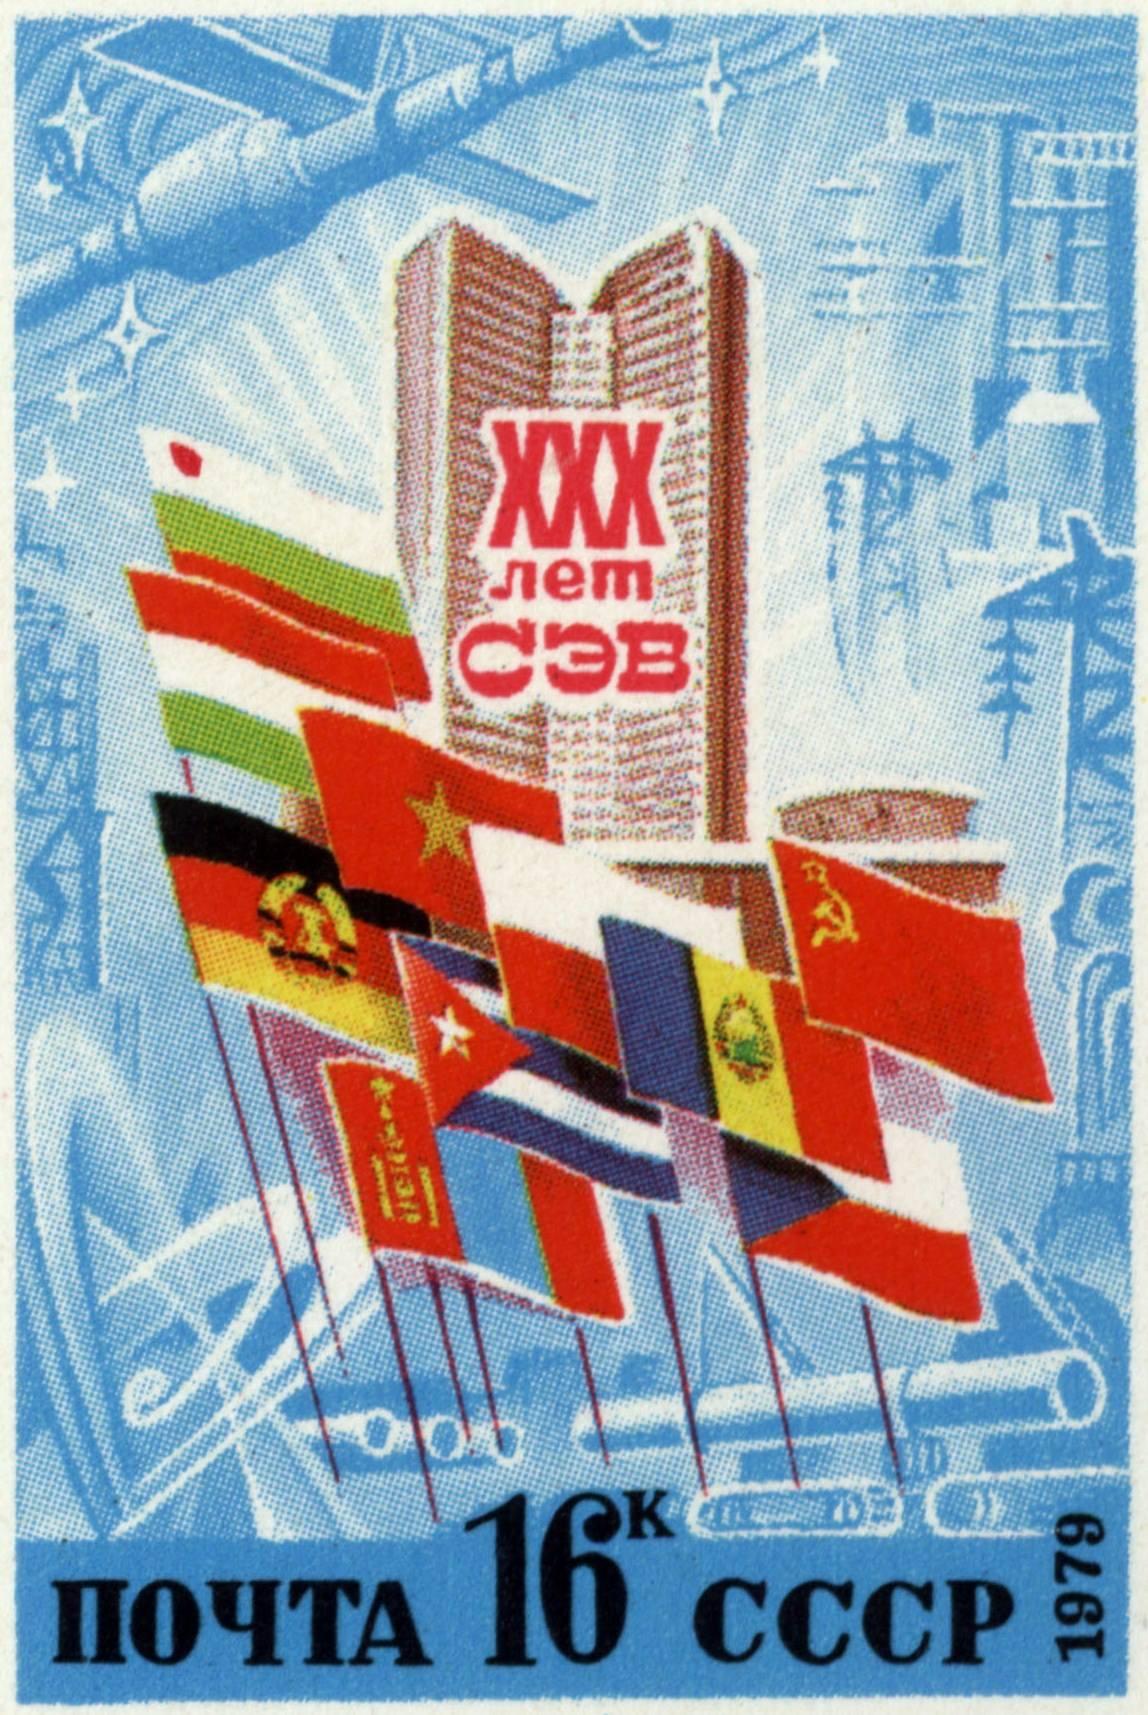 Economía cubana (2)